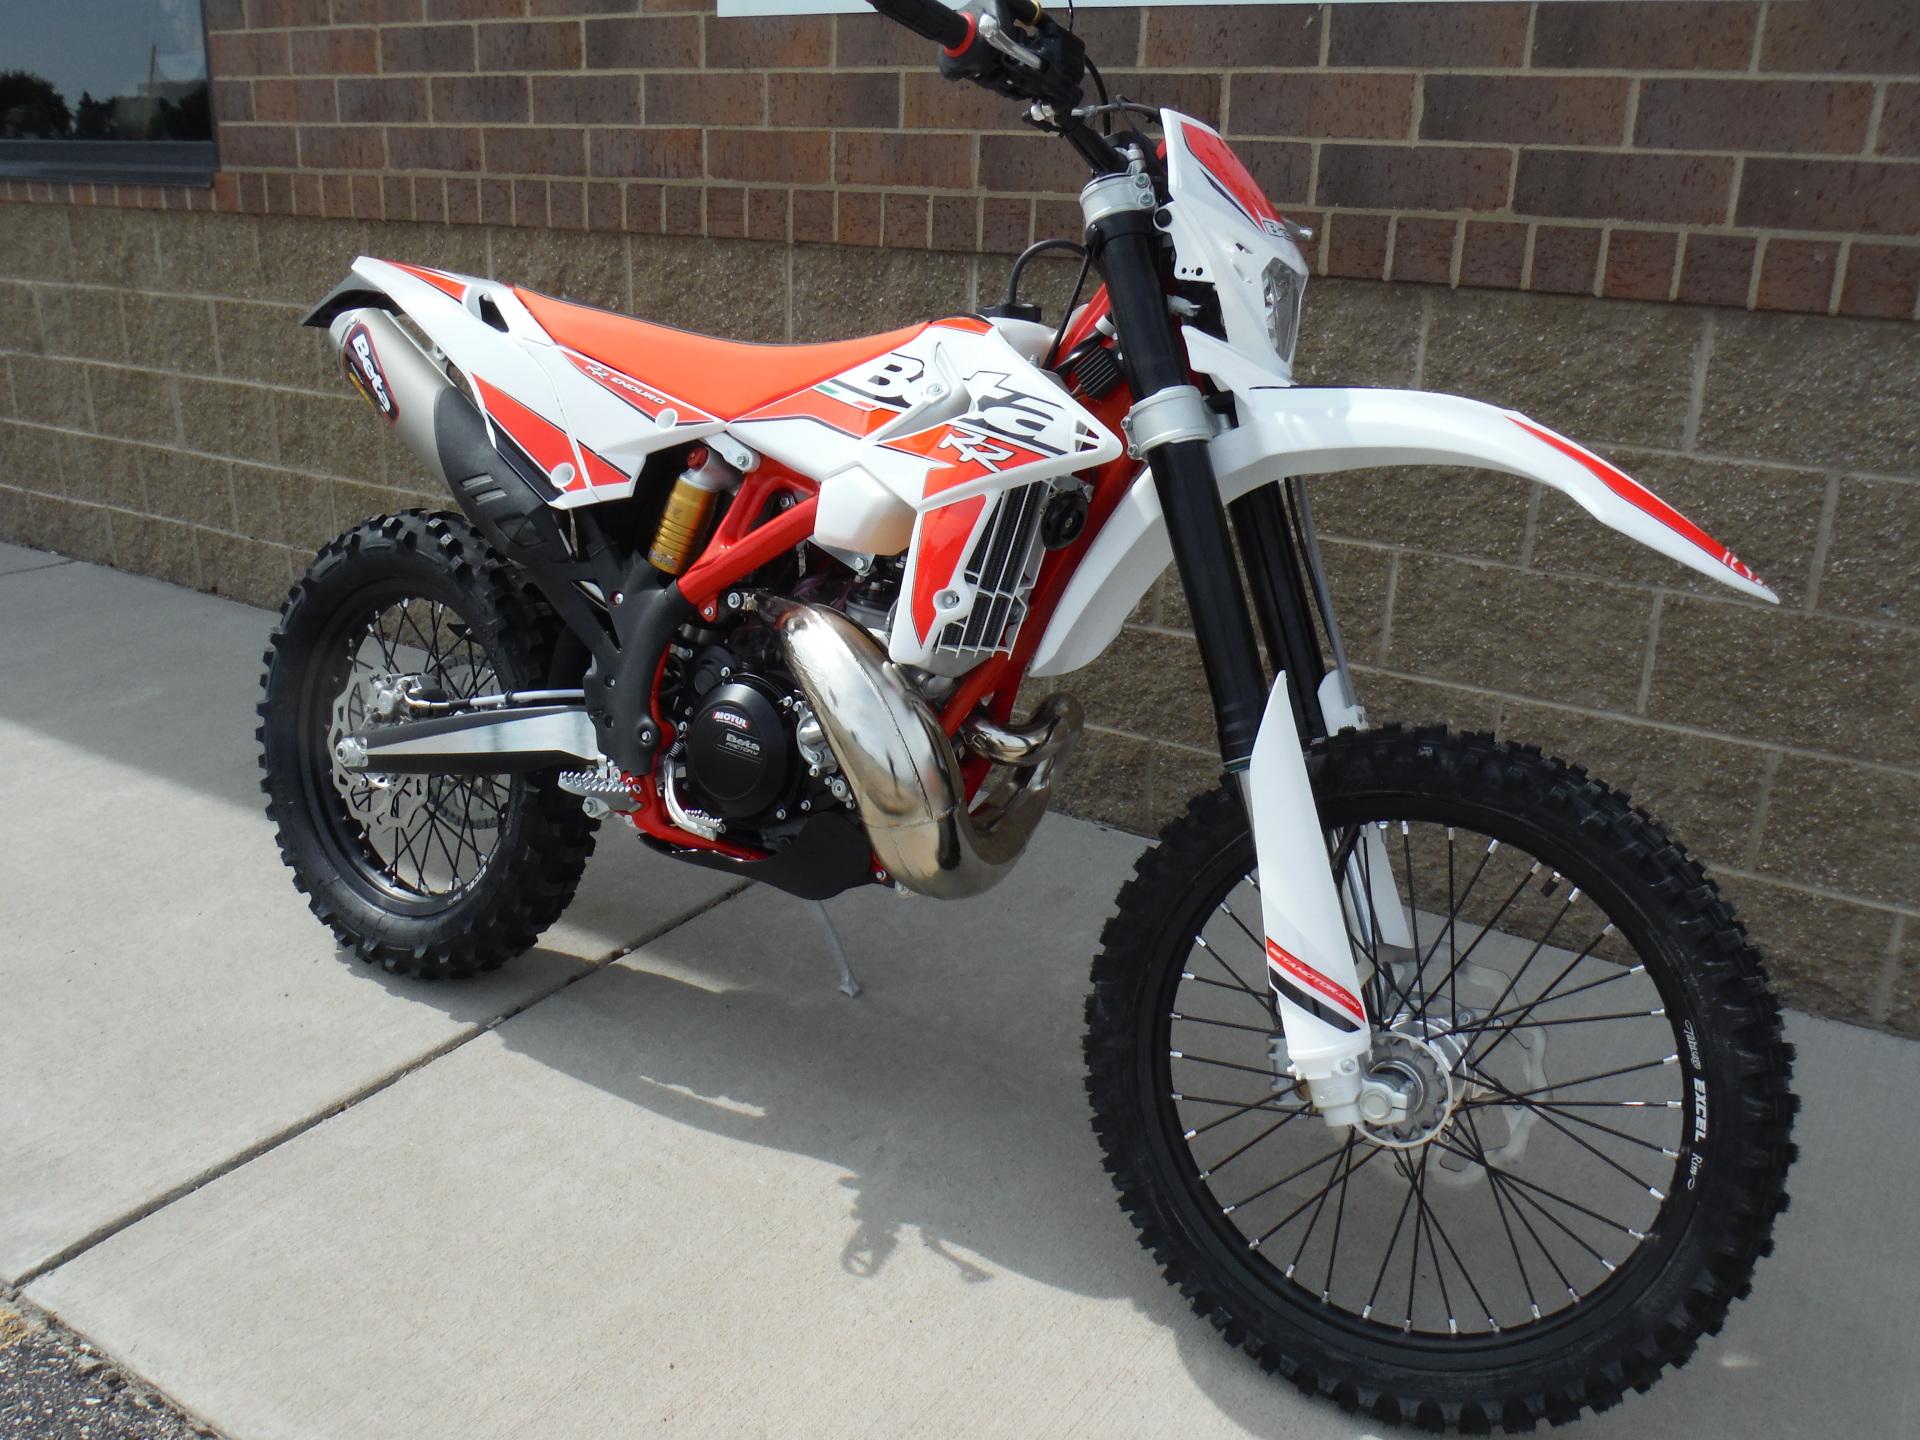 2018 Beta 300 RR